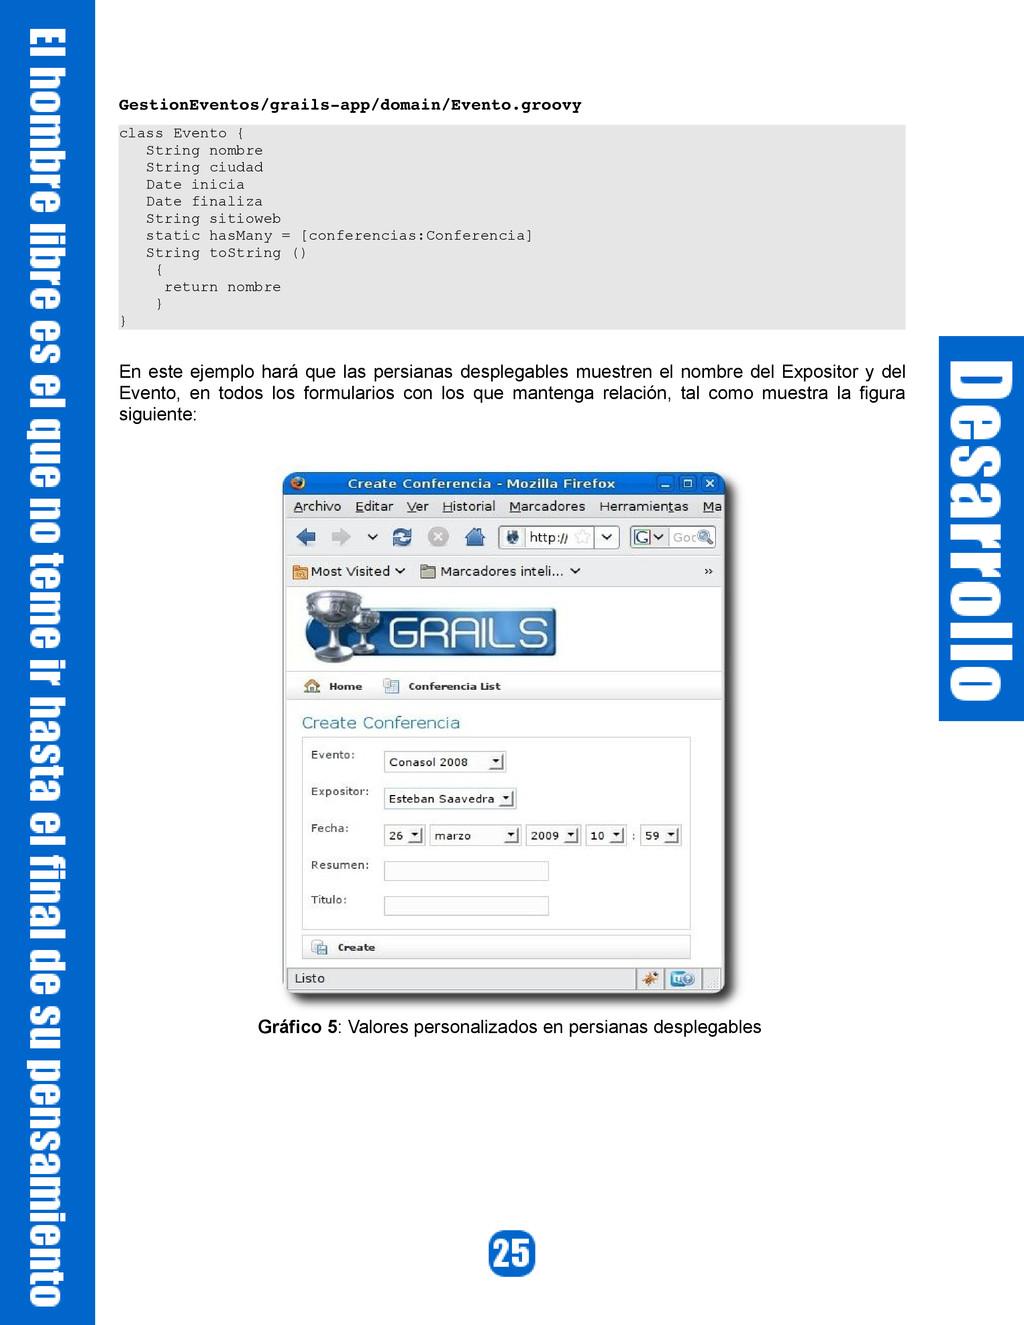 GestionEventos/grailsapp/domain/Evento.groovy ...